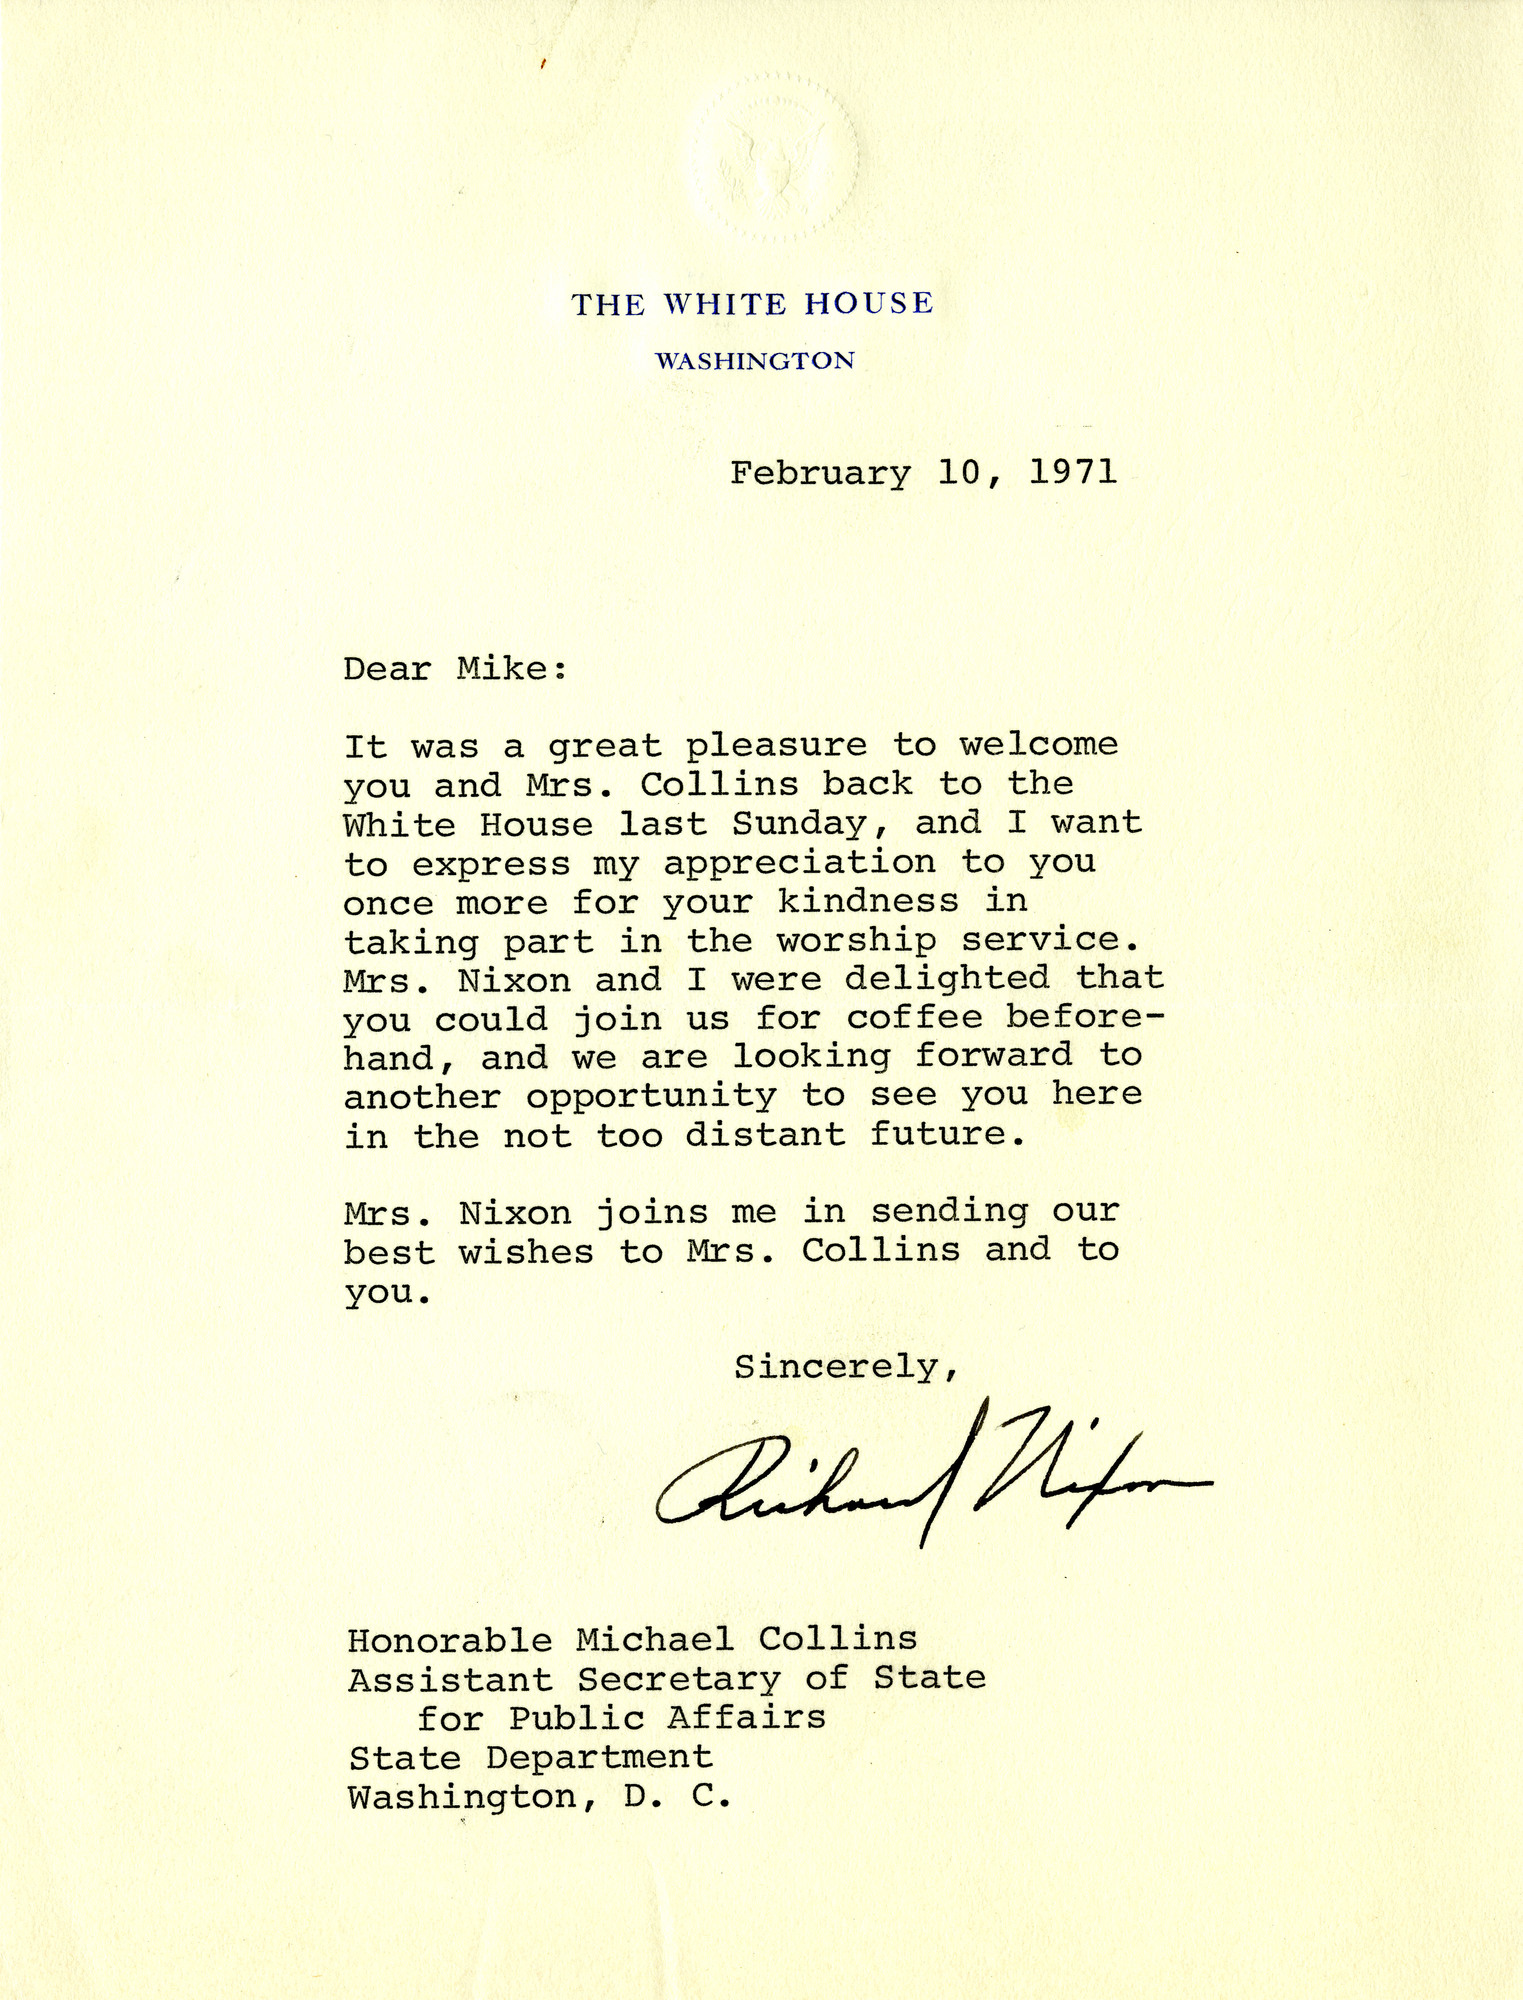 http://spec.lib.vt.edu/pickup/Omeka_upload/Ms1989-029_B18_F1_MichaelCollins_Letter_1971_0210.jpg